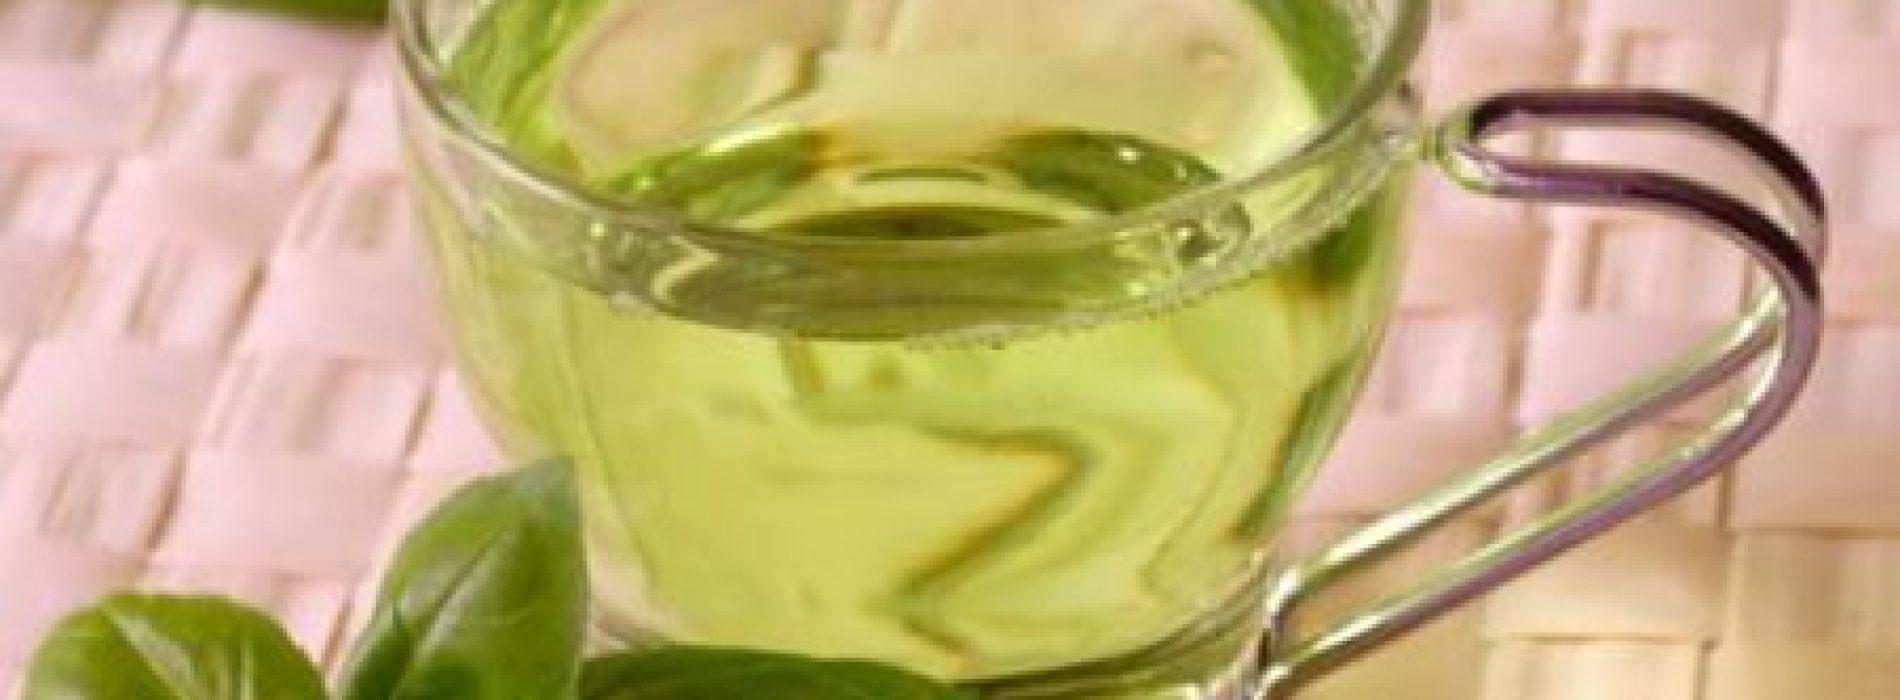 Groene thee en tai chi houden botten sterk en gezond